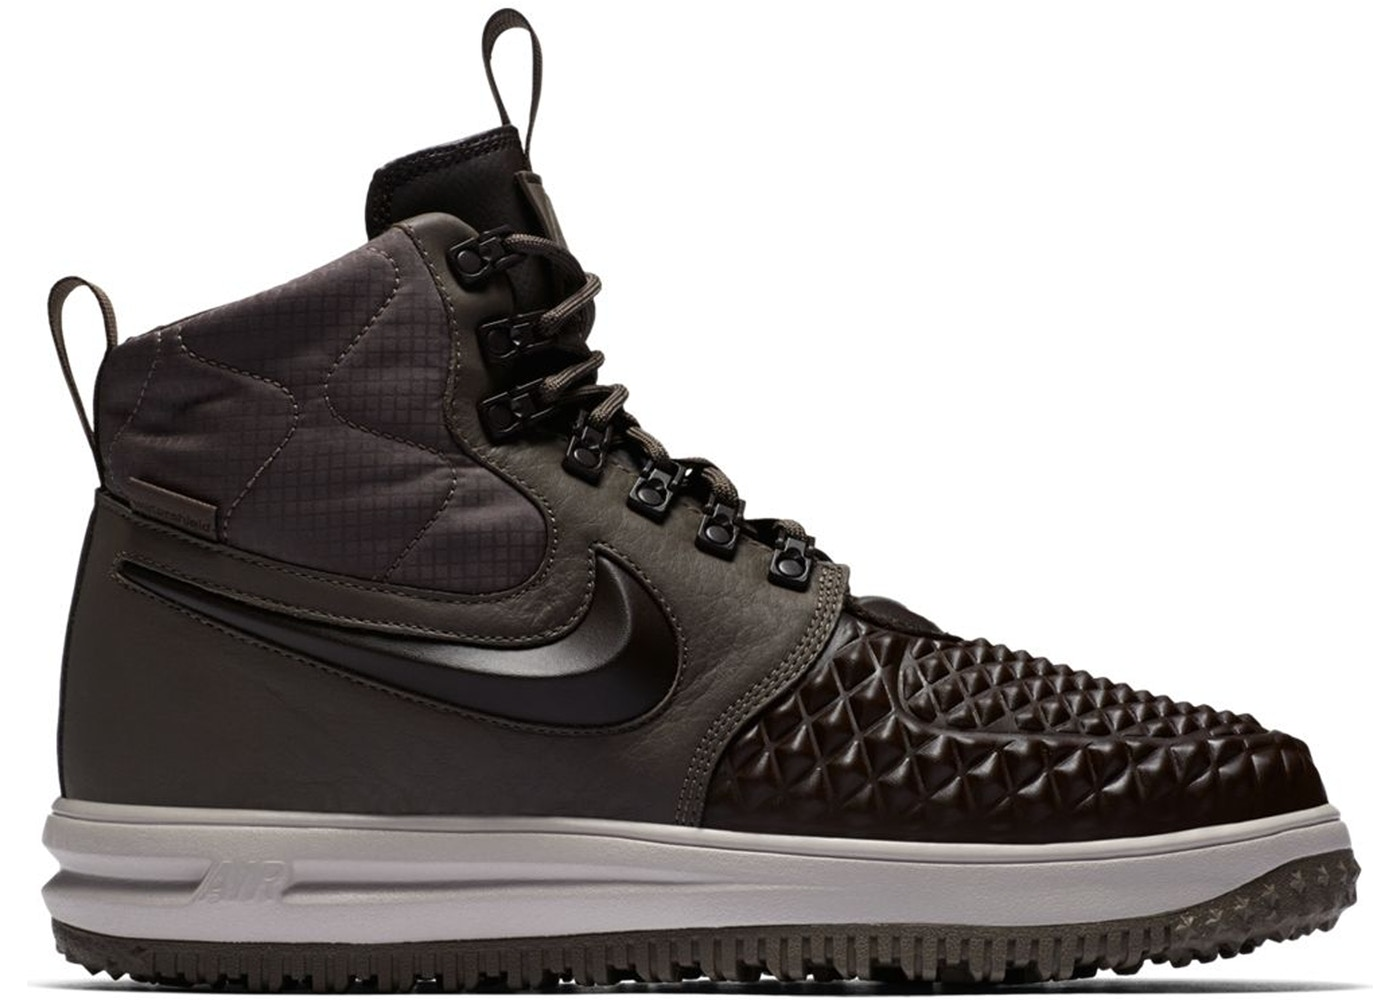 pubertad intimidad no pagado  Nike Lunar Force 1 Duckboot 17 Ridgerock Velvet Brown - 916682-203